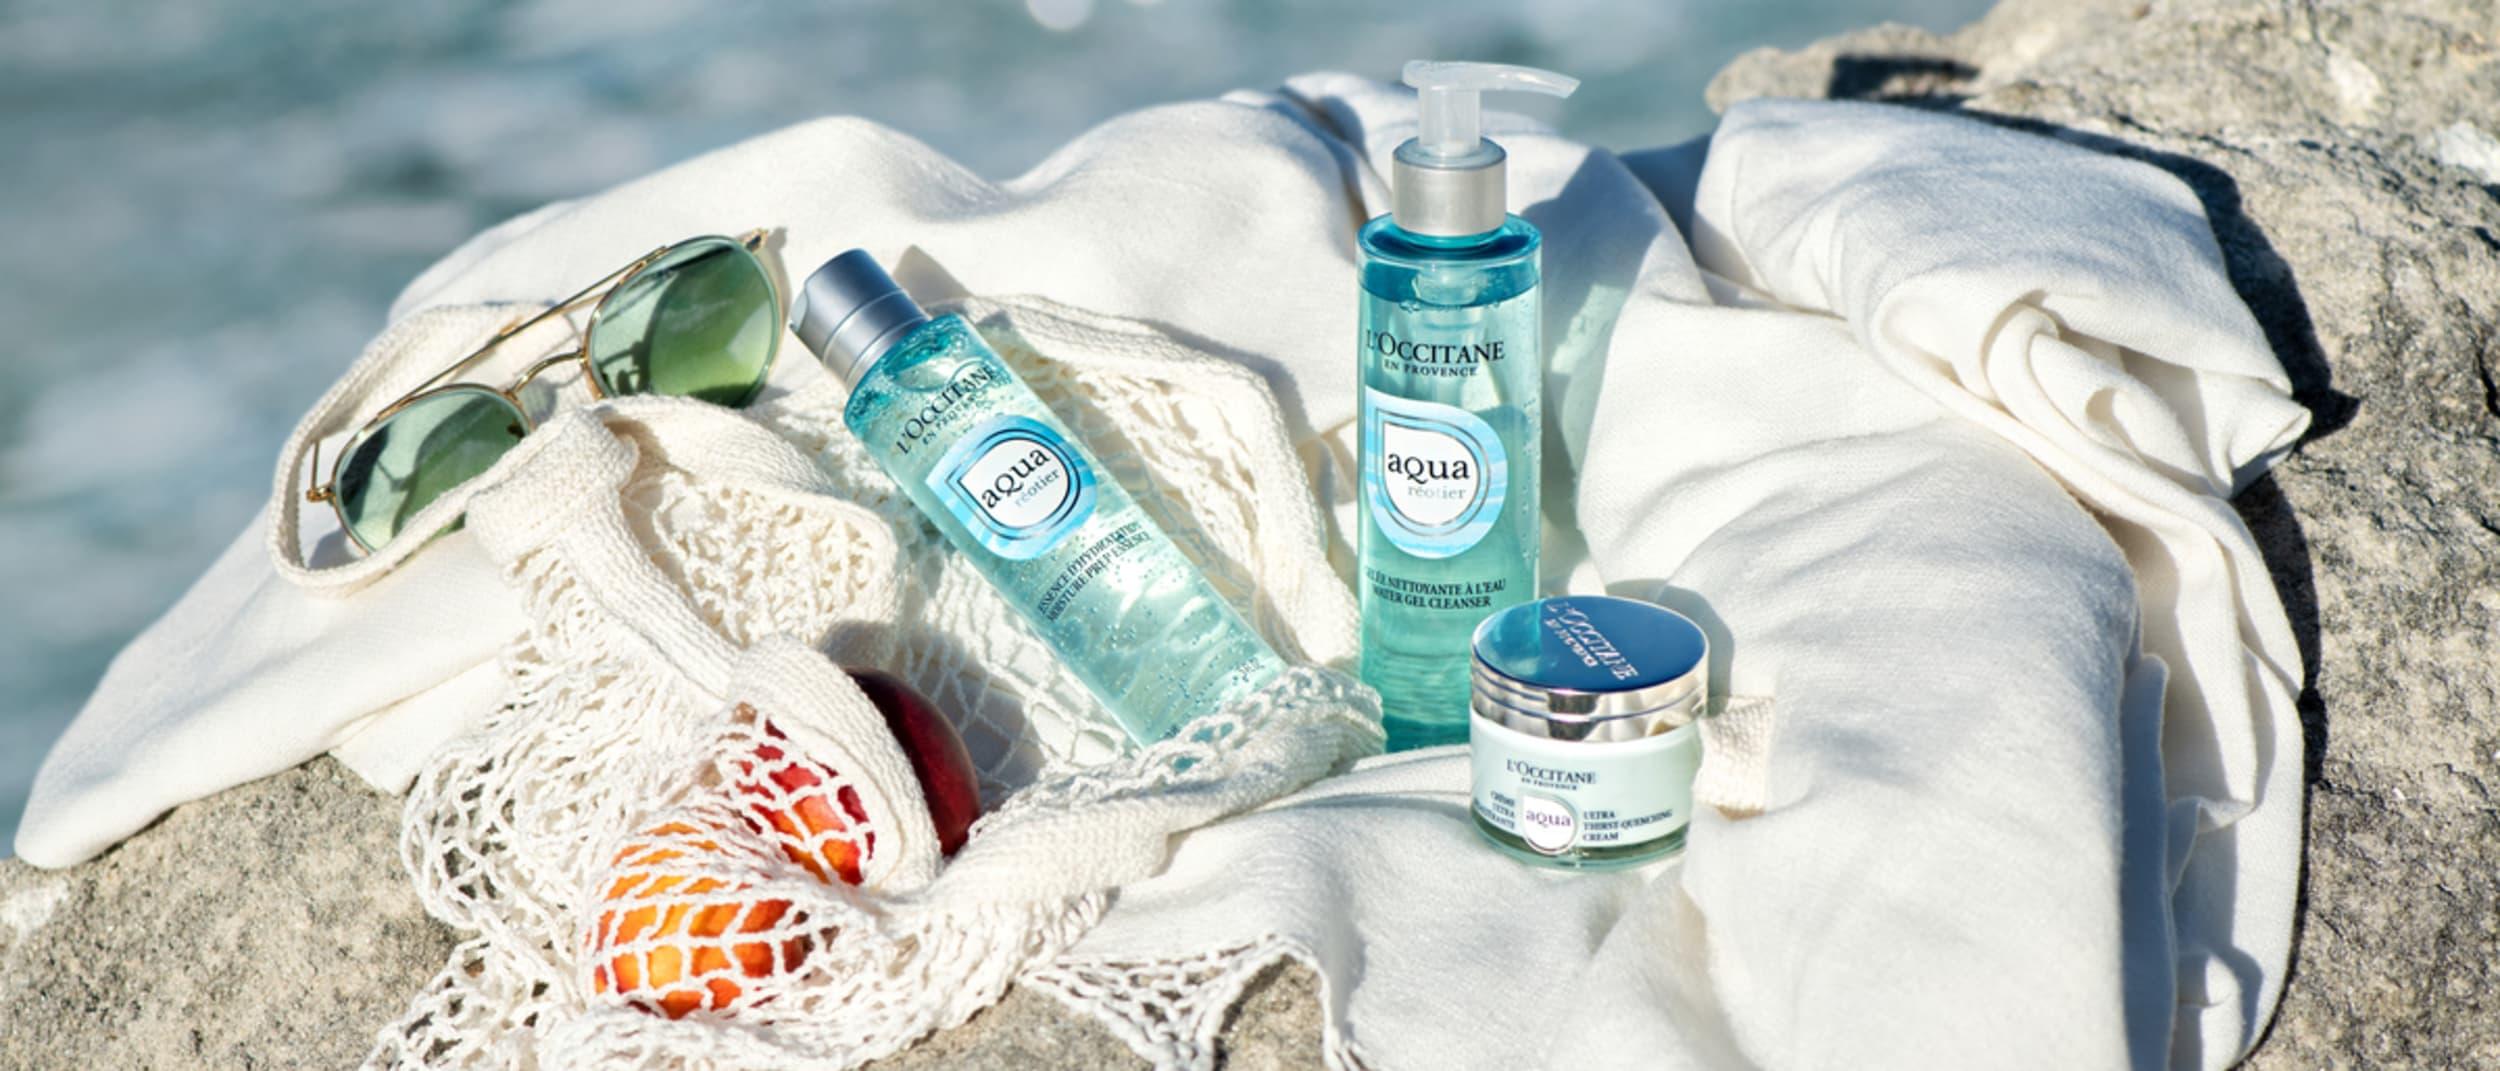 L'OCCITANE: Find your perfect summer skincare combination